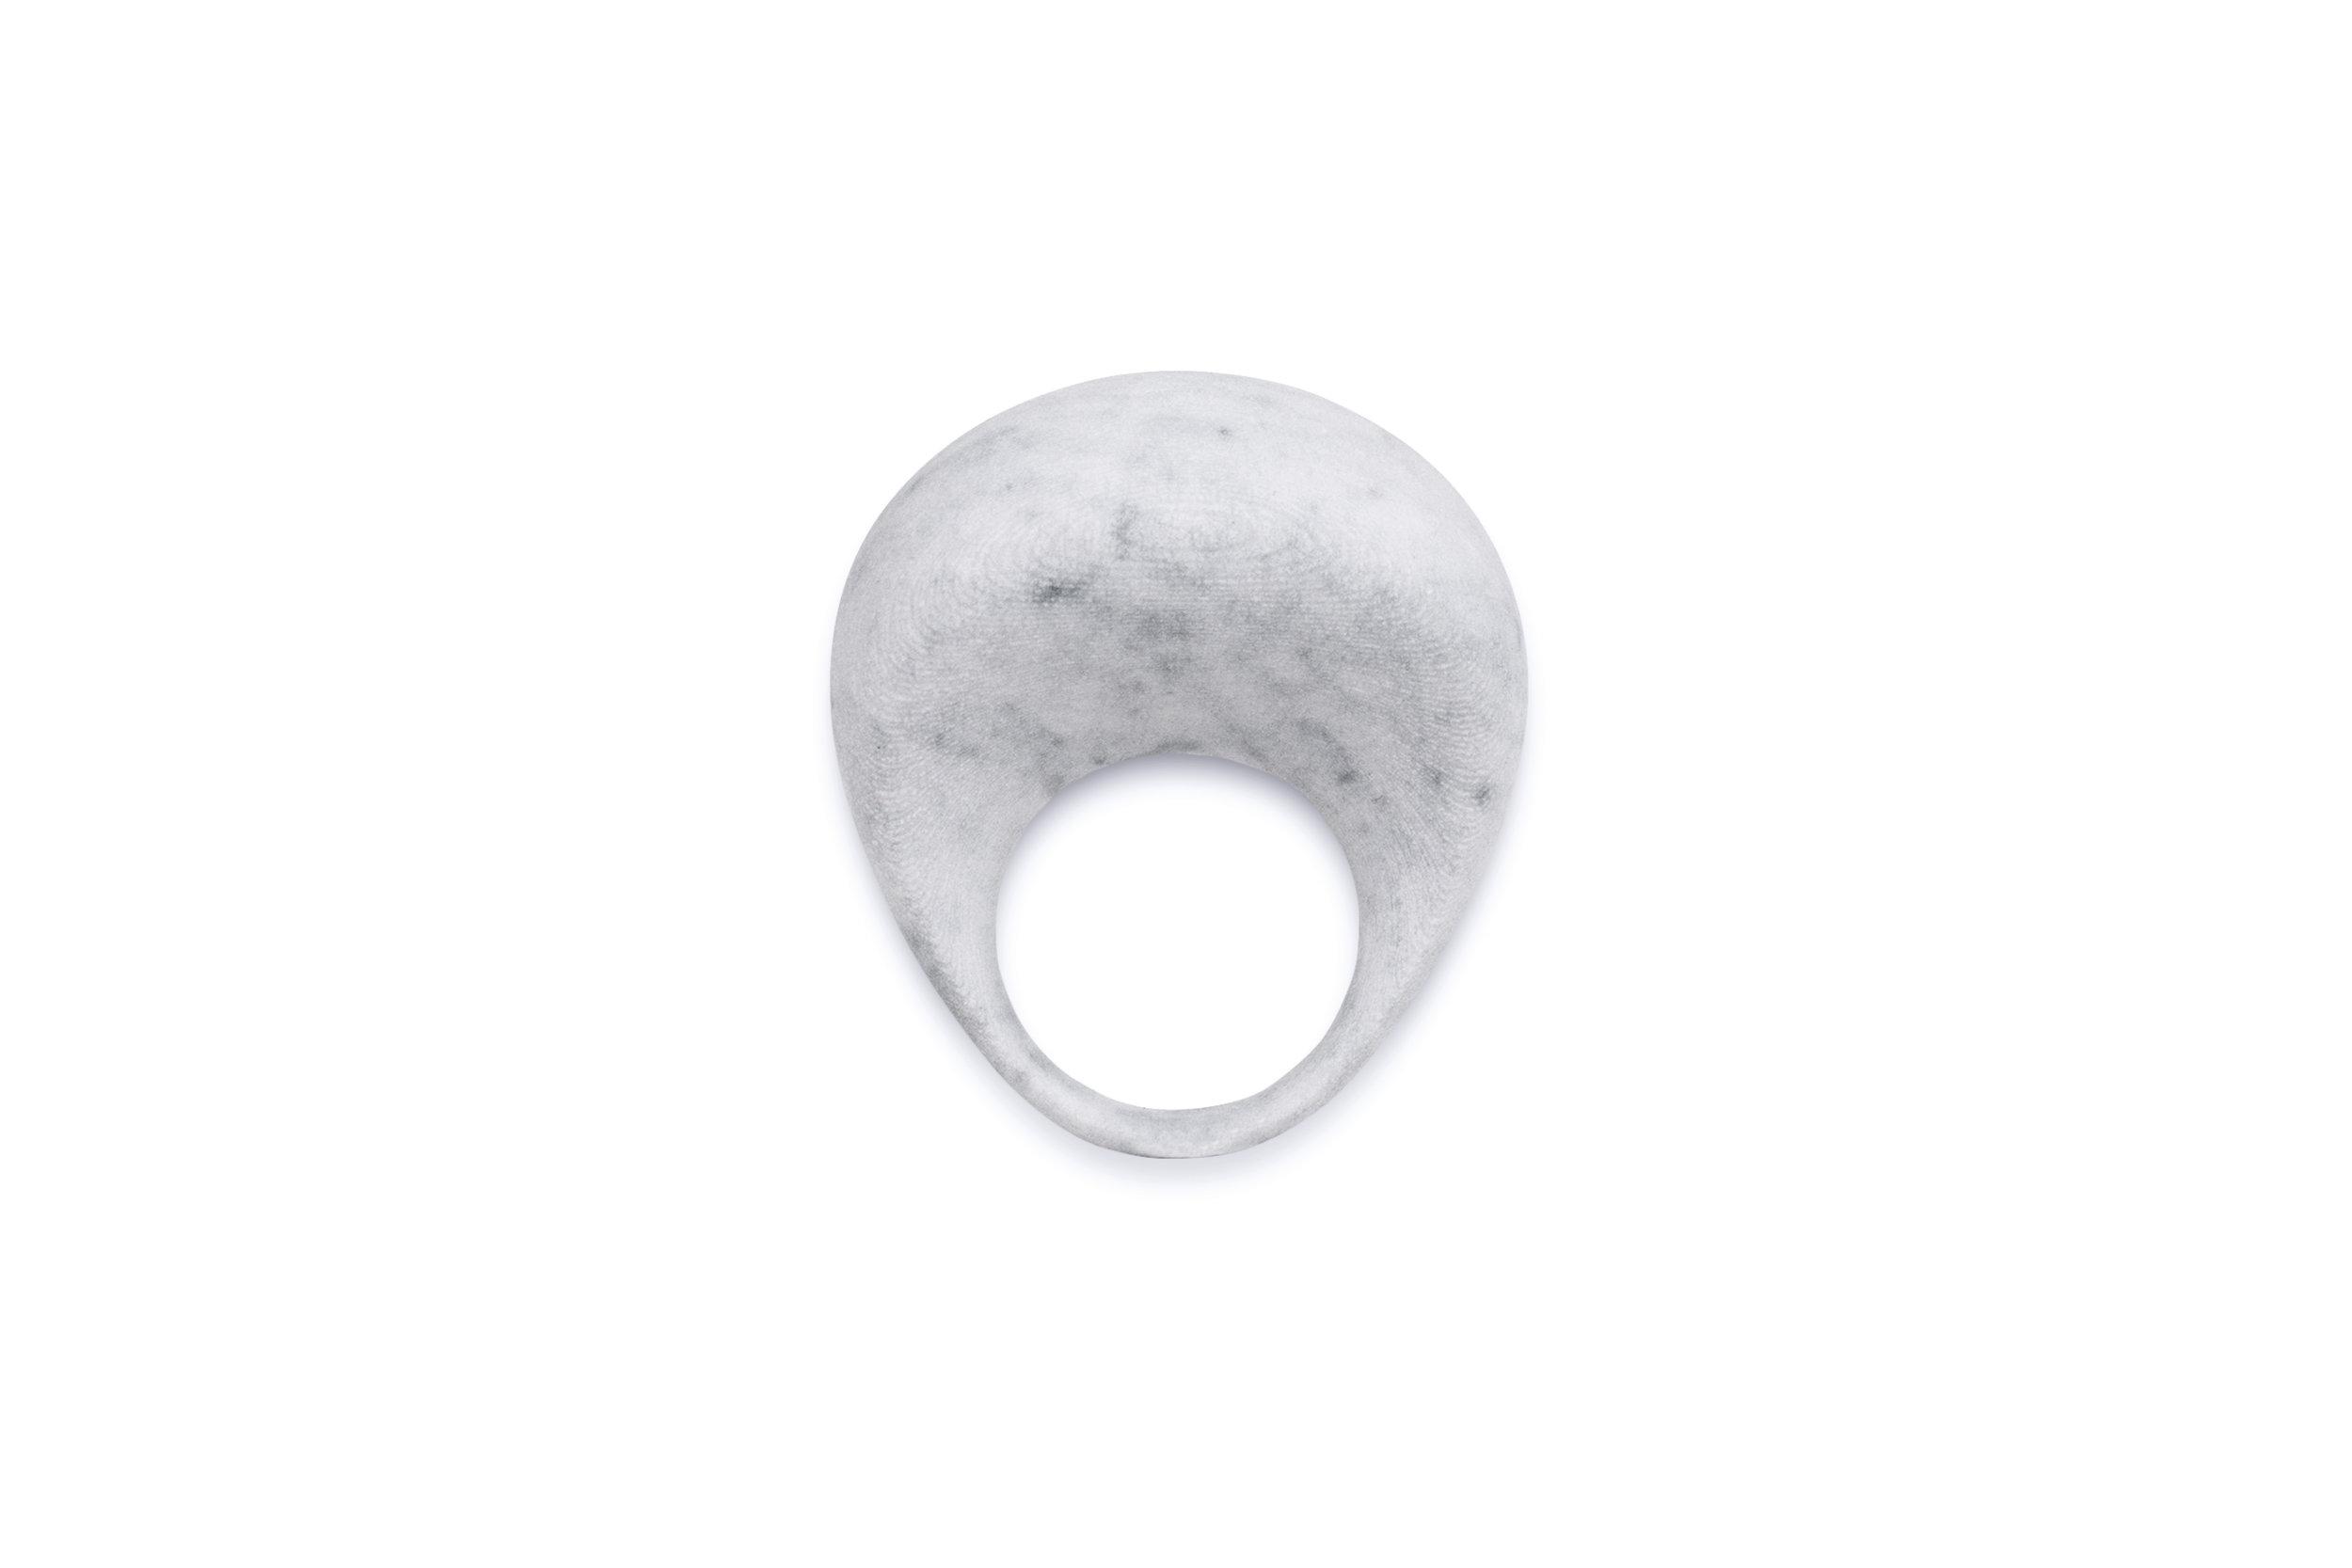 Aurelia_Ring_Digital Marble_Carrara_Space Junk_2014.jpg